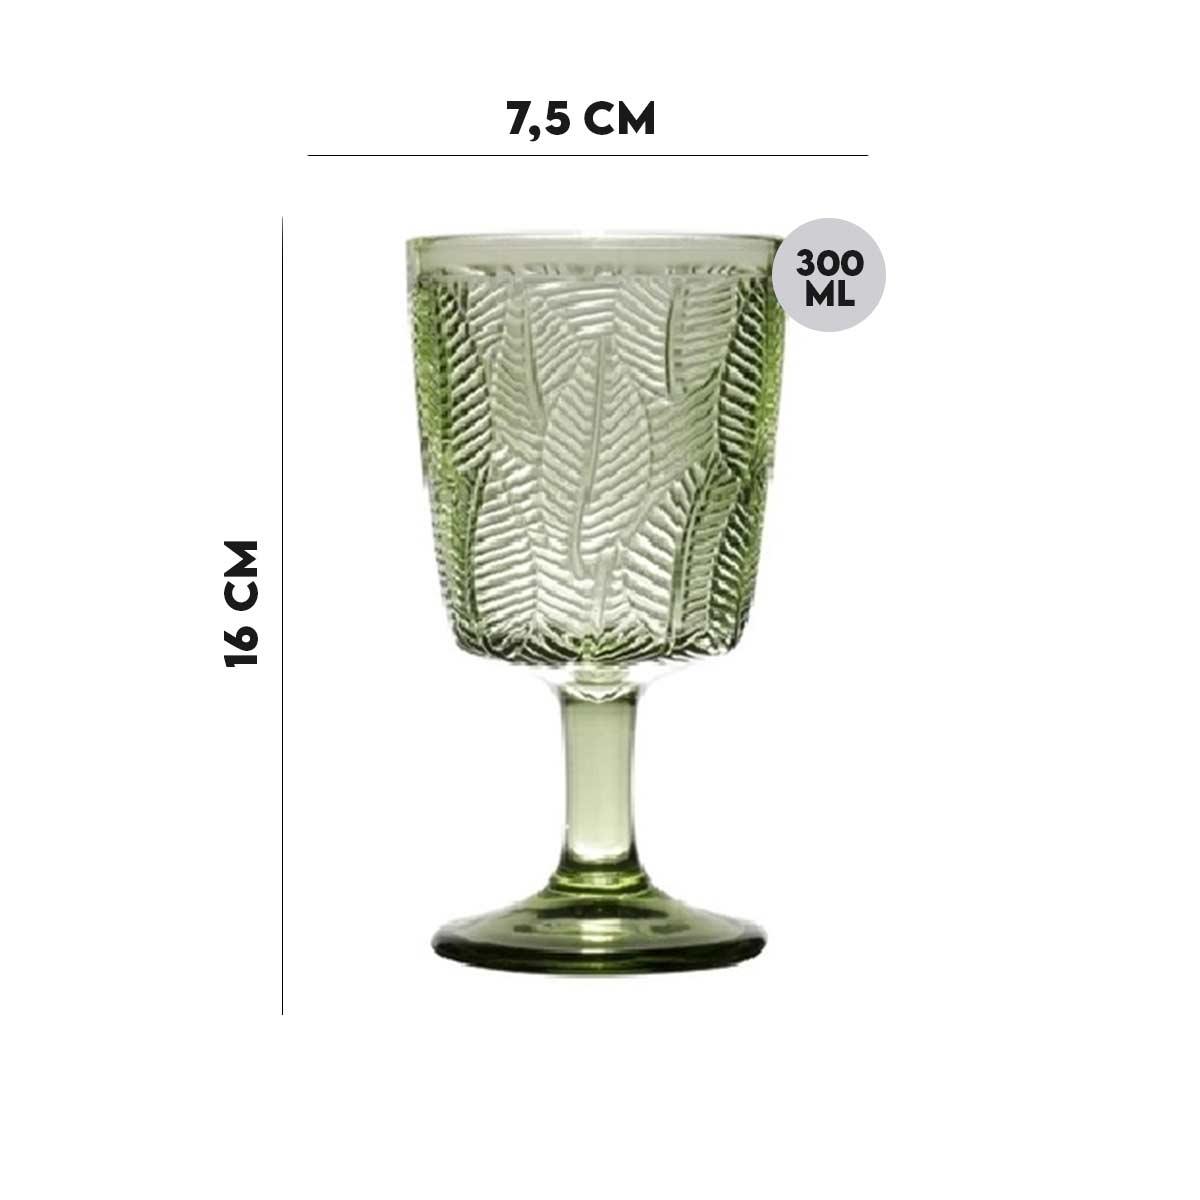 Kit 6 Taças p/ água Vidro Sodo-Cálcico Leaves Verde 300 ml  - Lemis